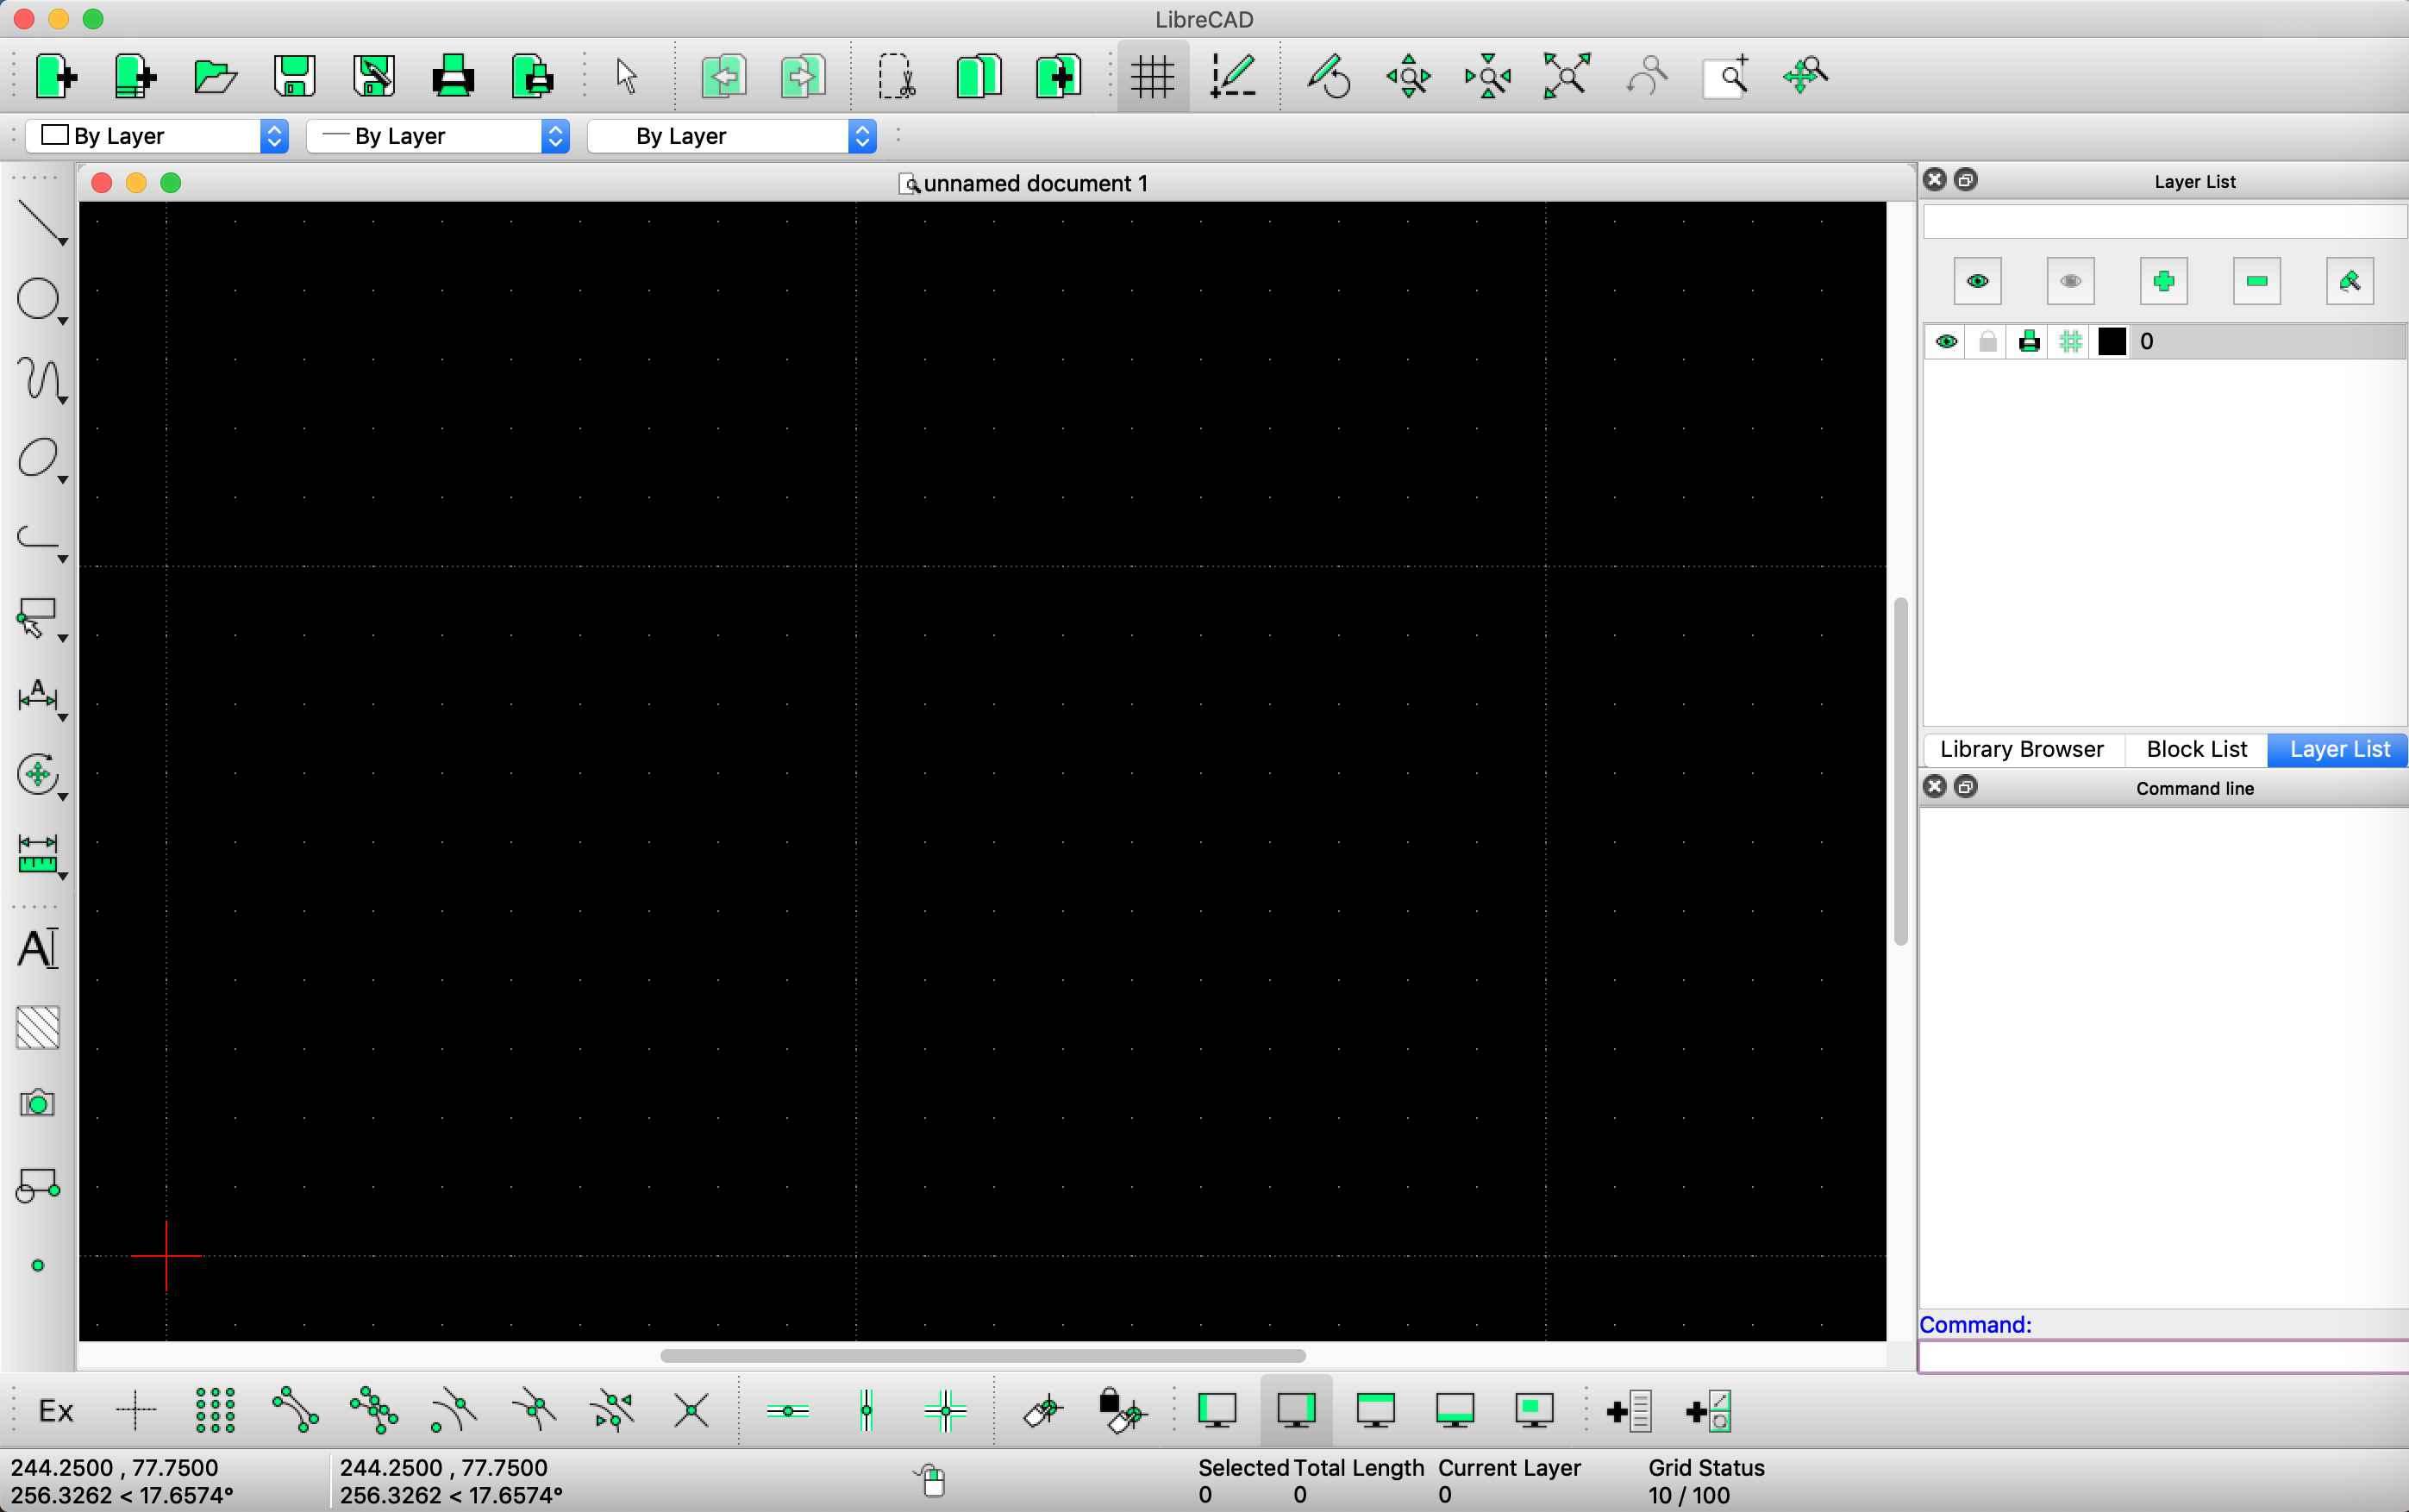 LibreCAD screenshot on macOS